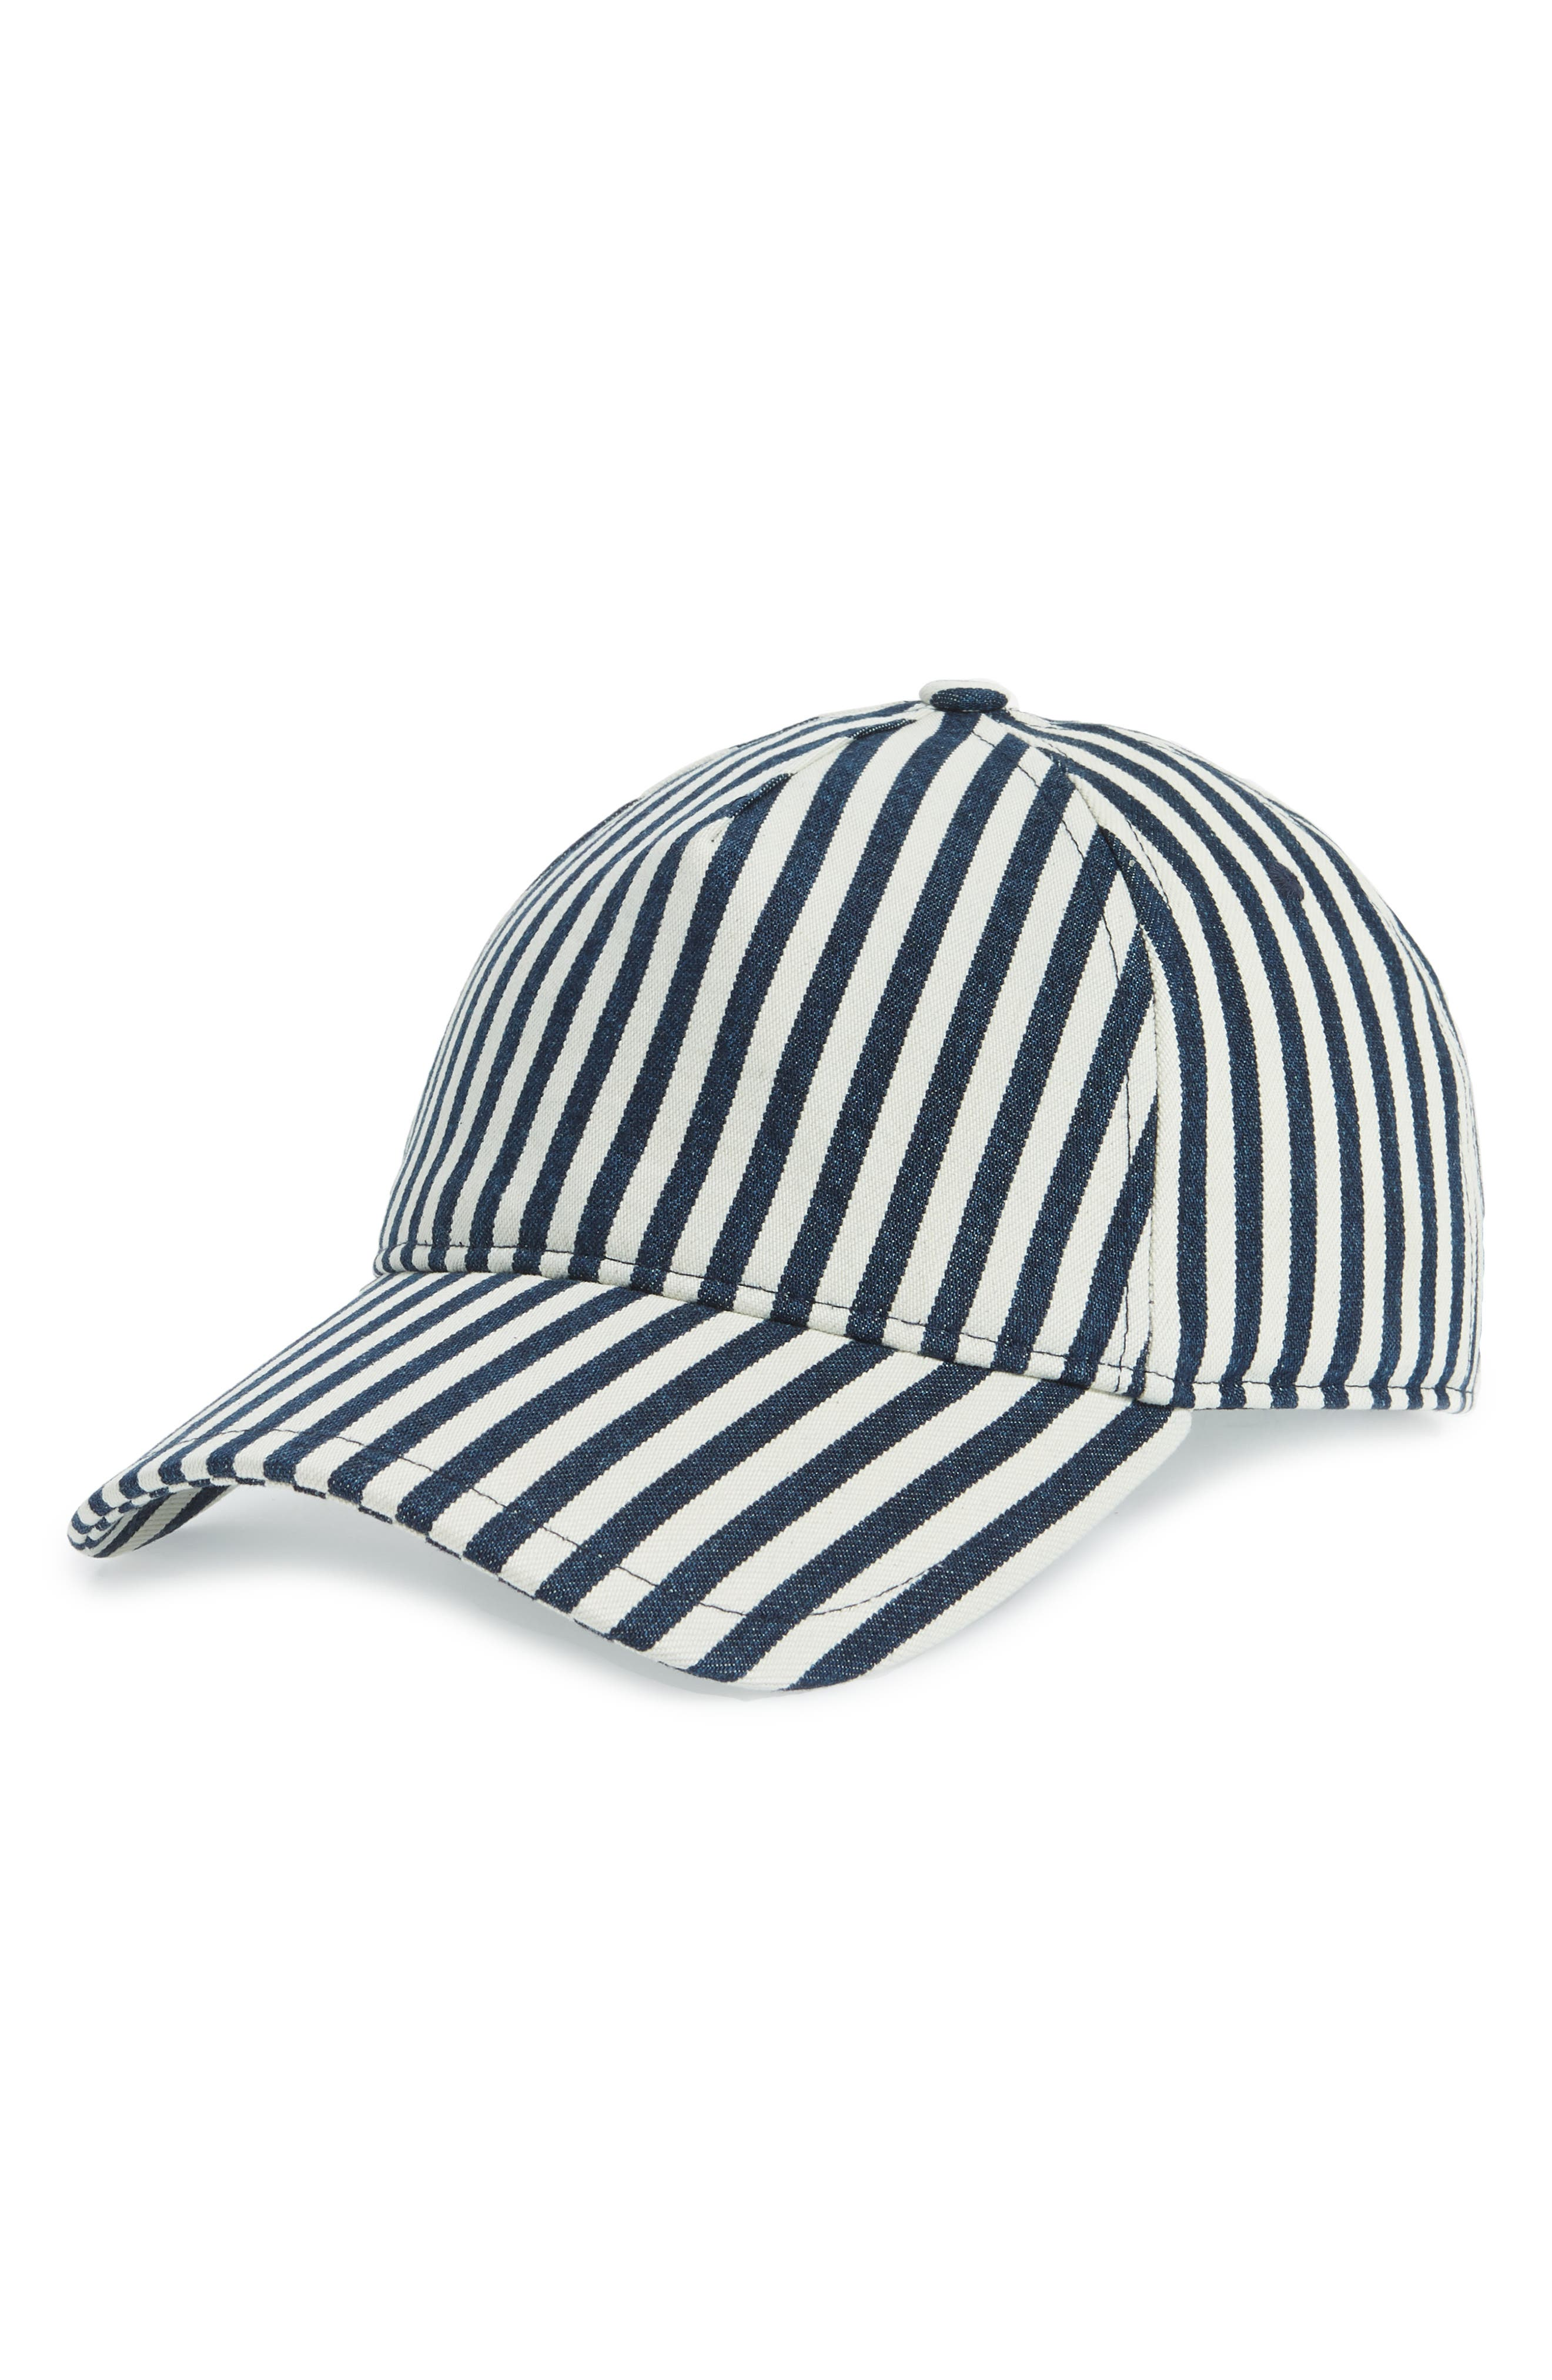 Marilyn Baseball Cap,                         Main,                         color, NAVY/ NATURAL STRIPE